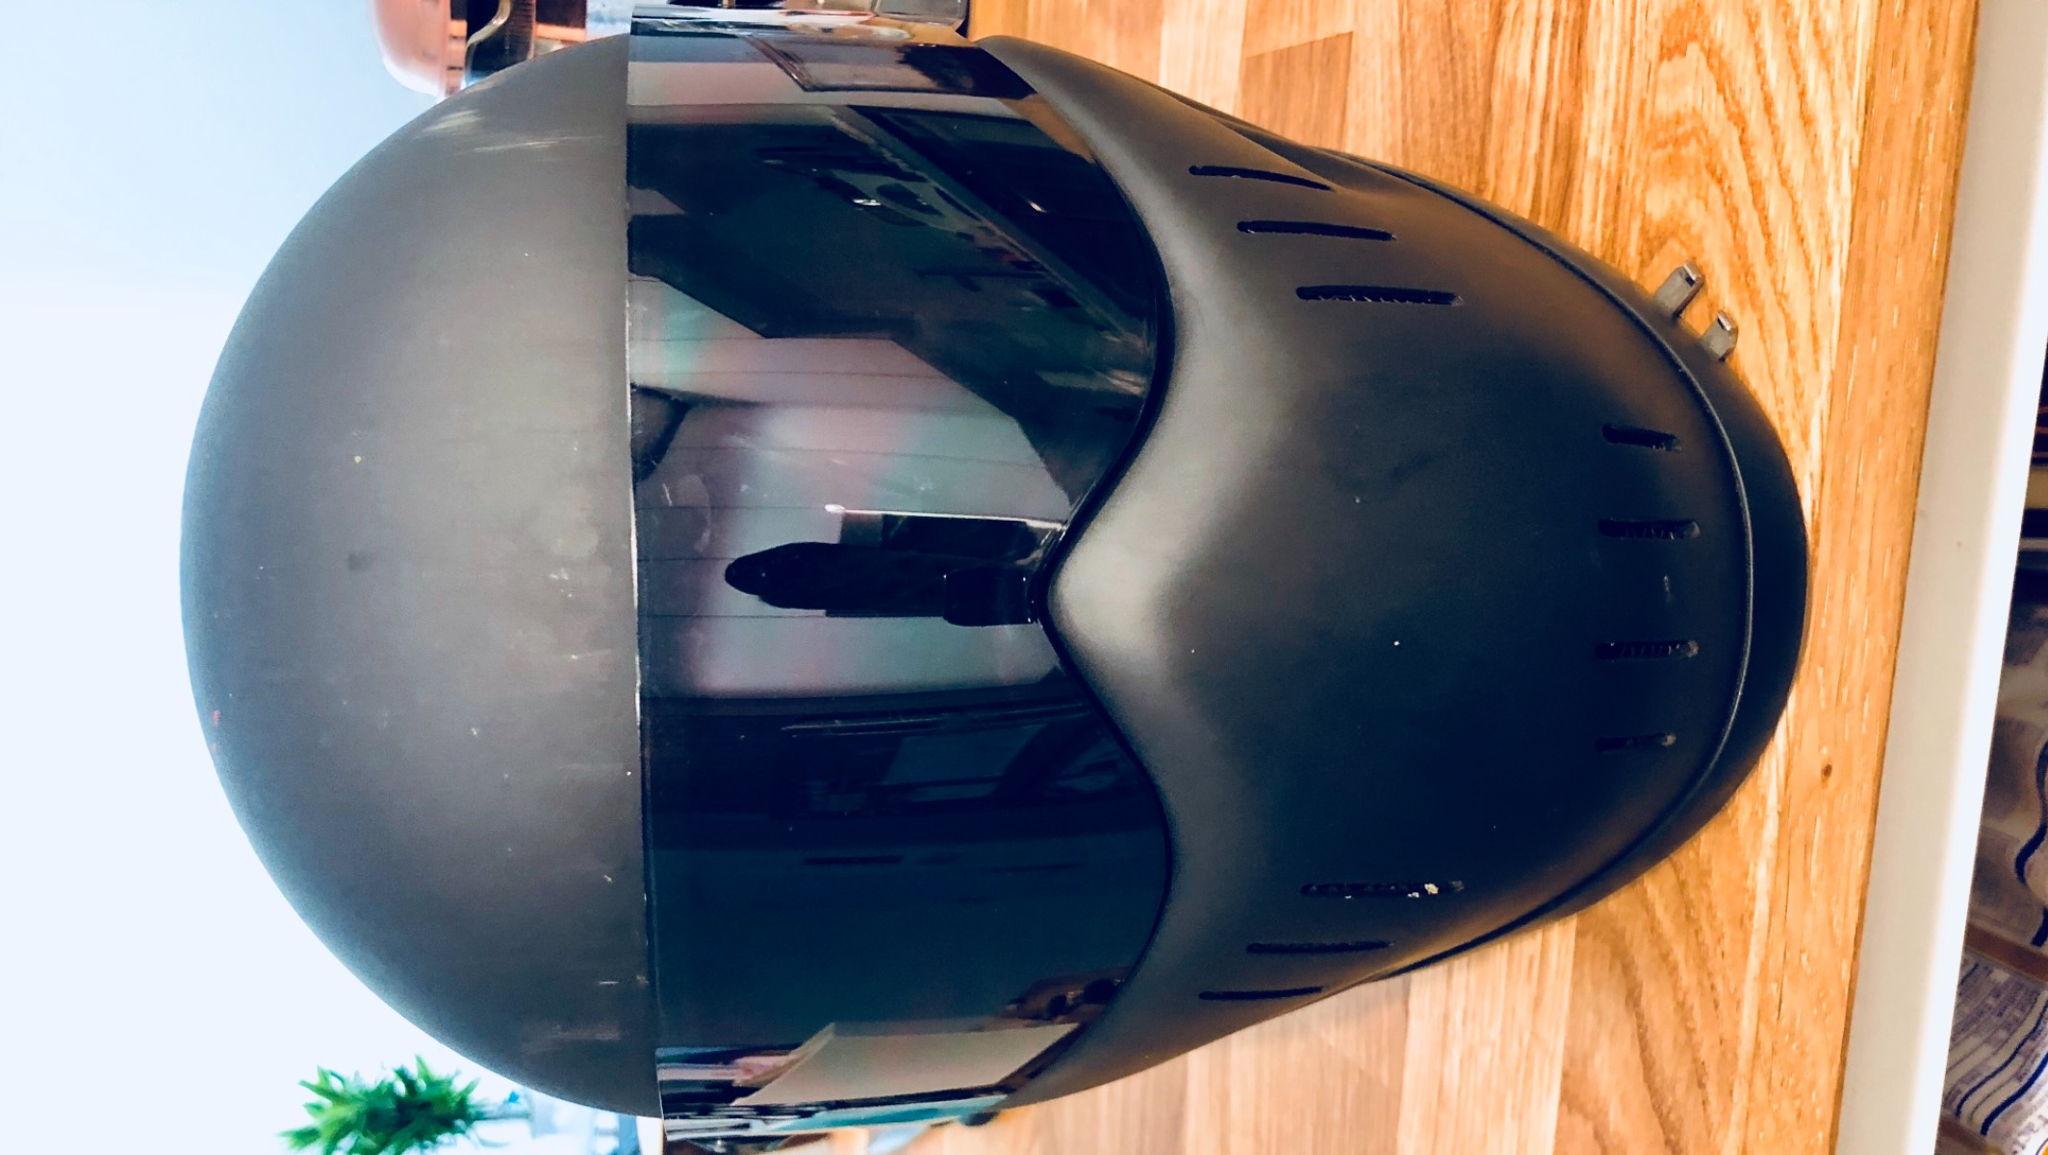 Kawasaki Ninja 250r For Rent Near Los Angeles Ca